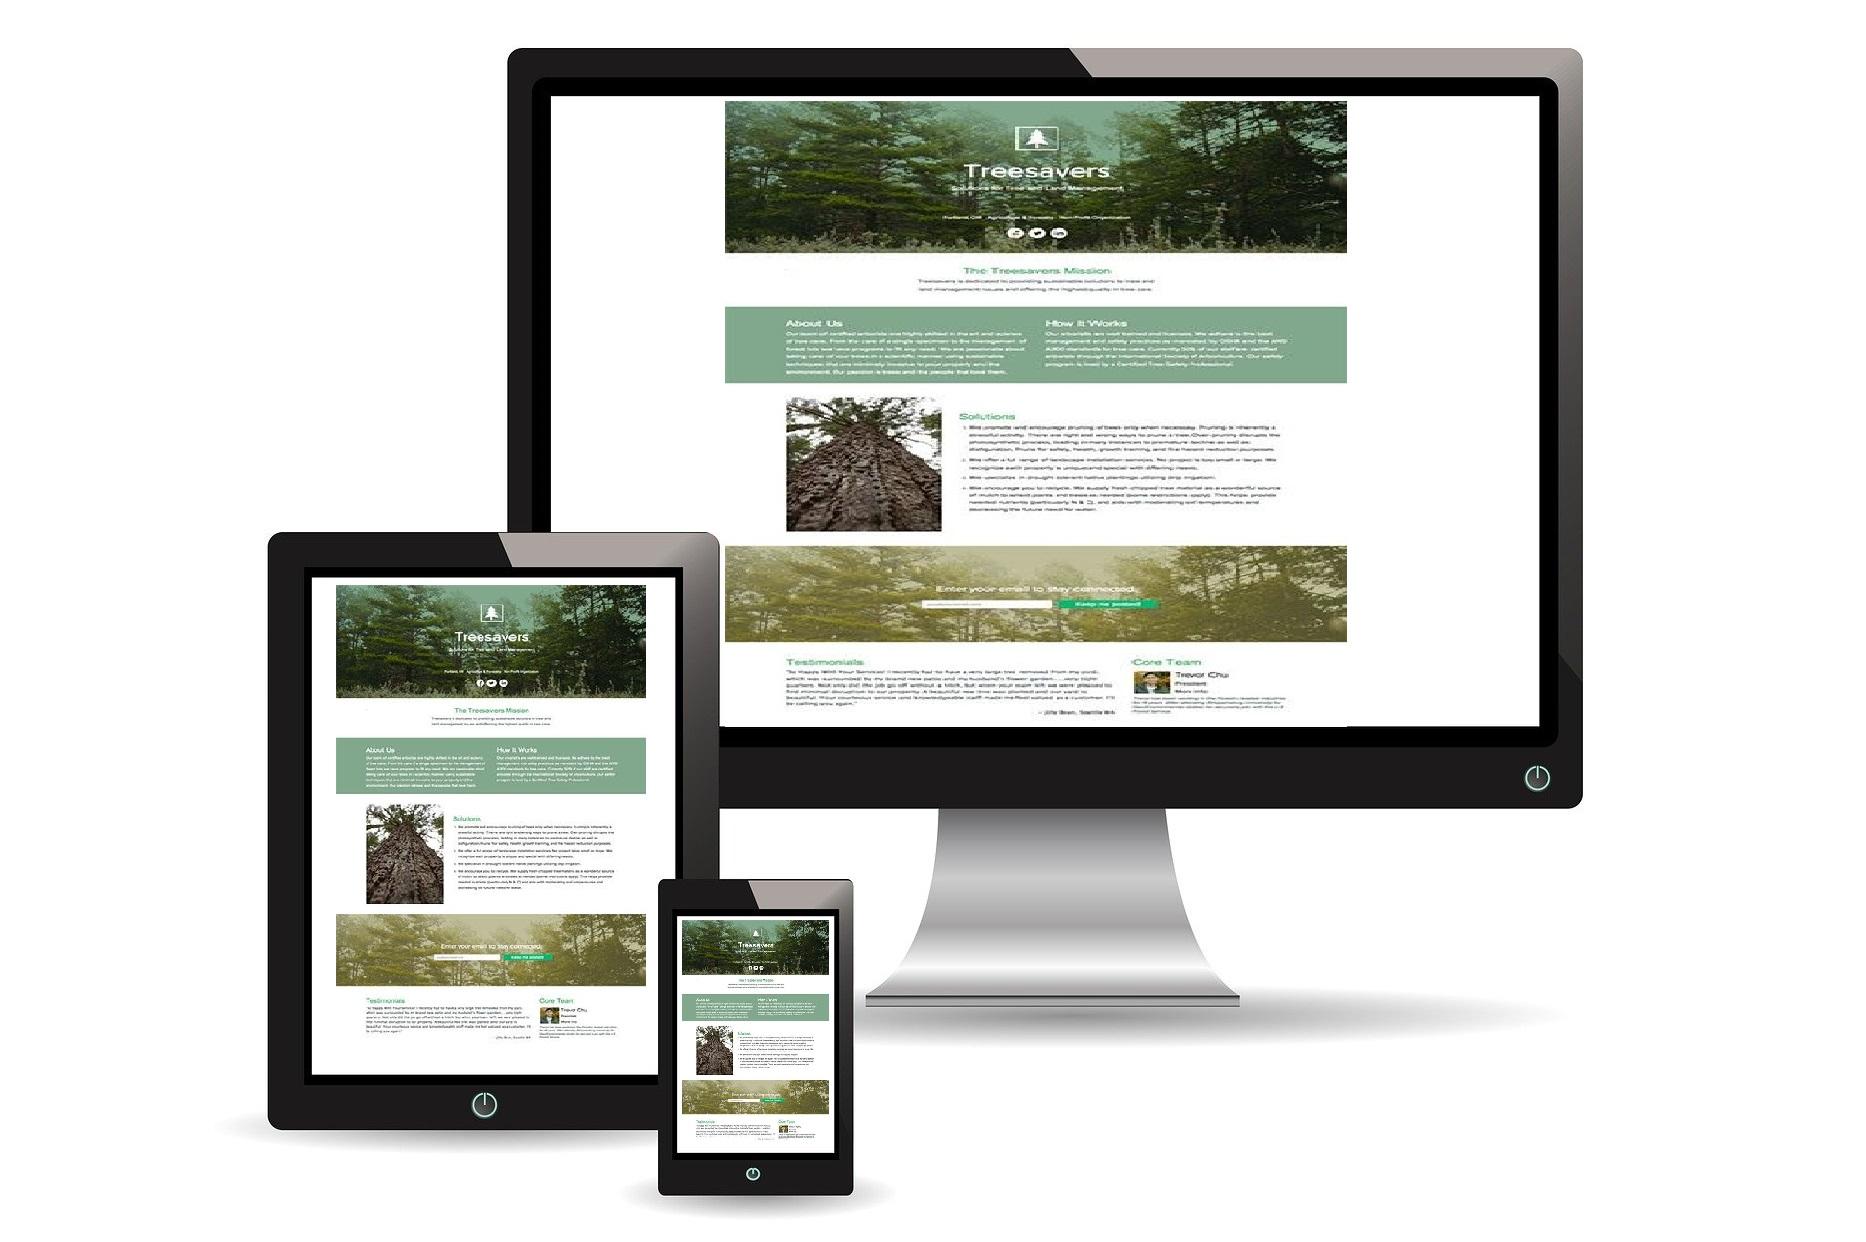 Fashahi Webdesign responsive_devices